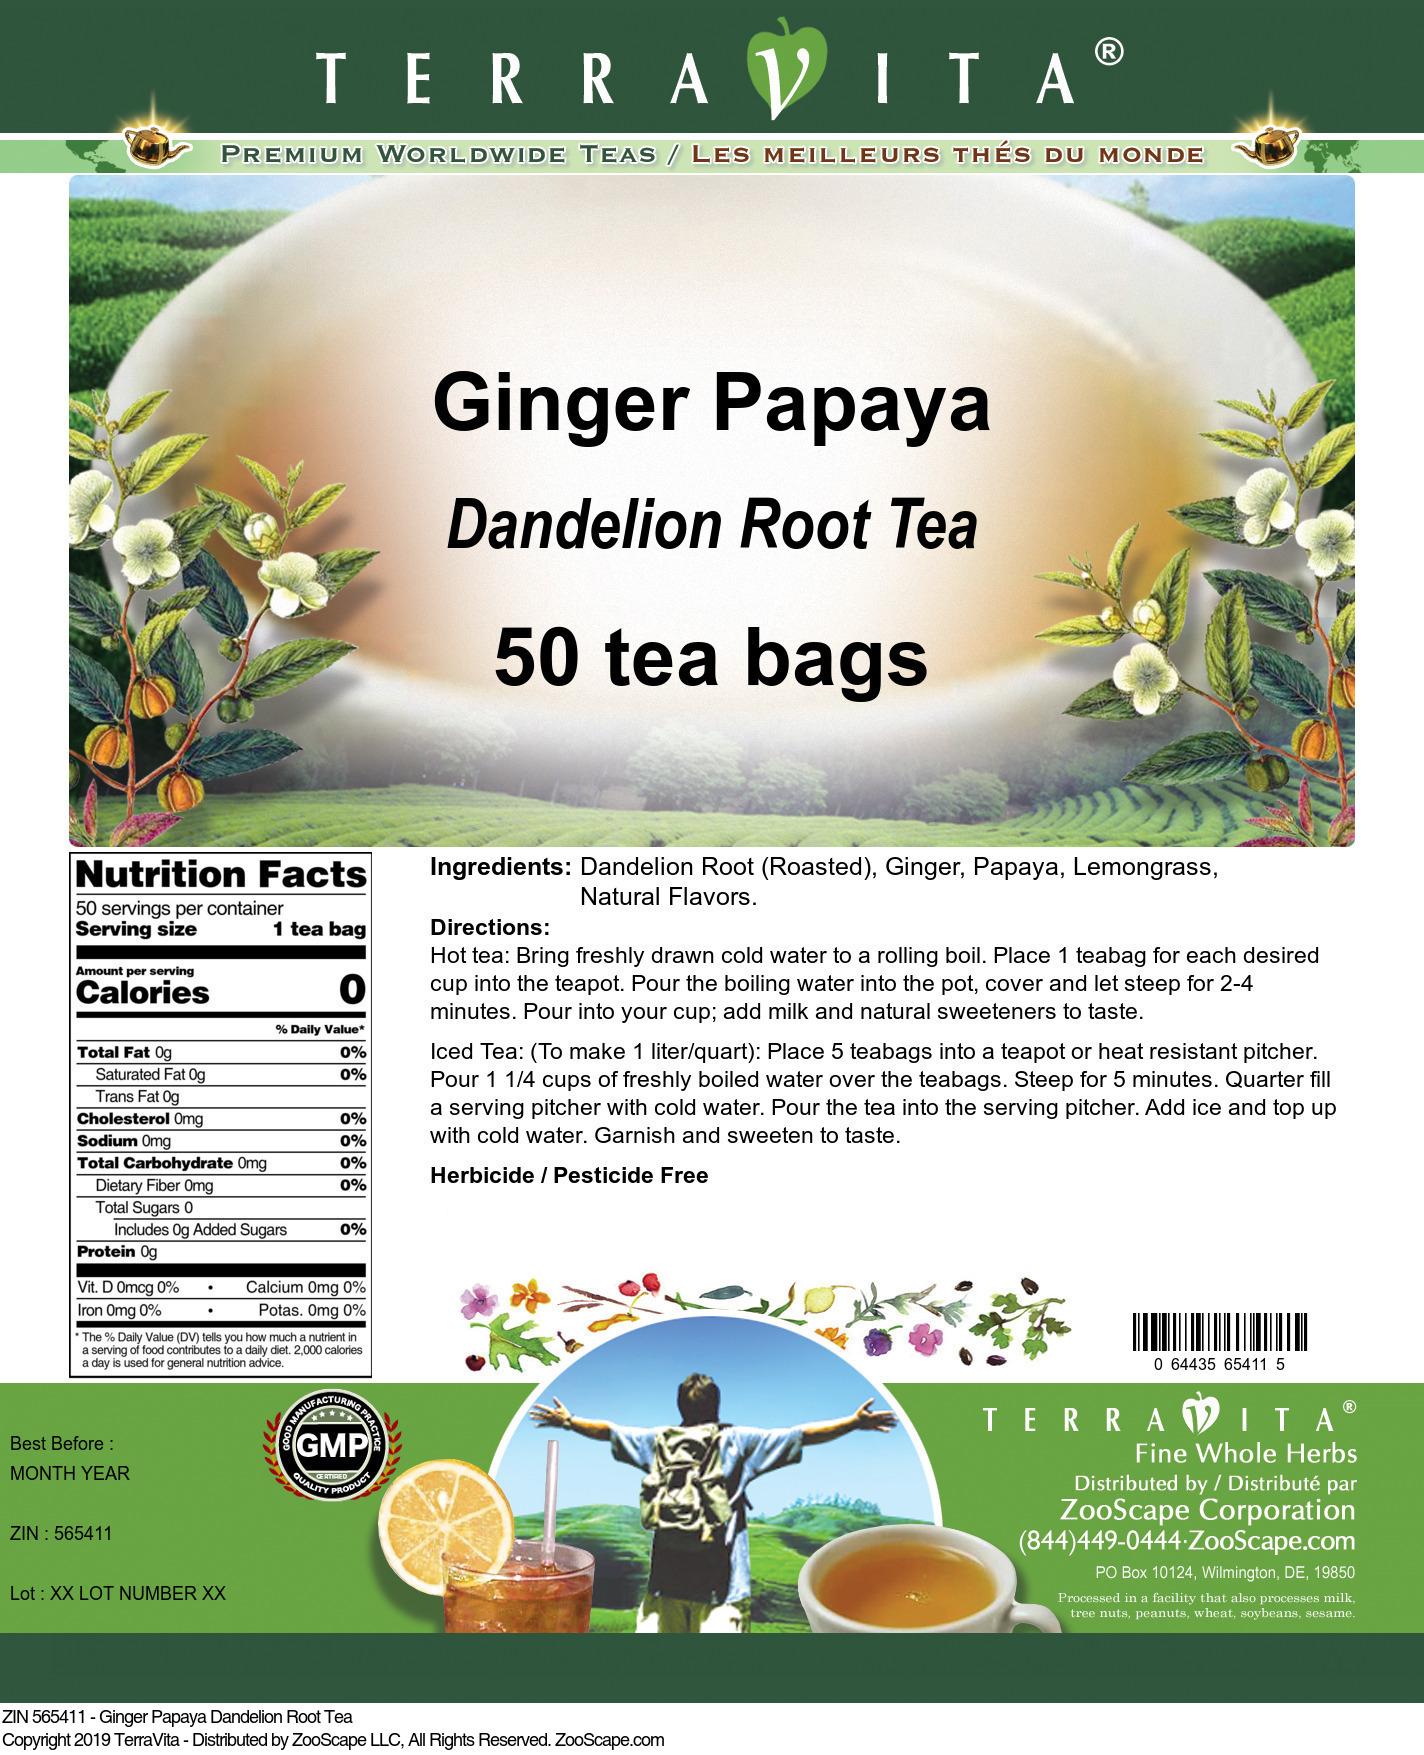 Ginger Papaya Dandelion Root Tea